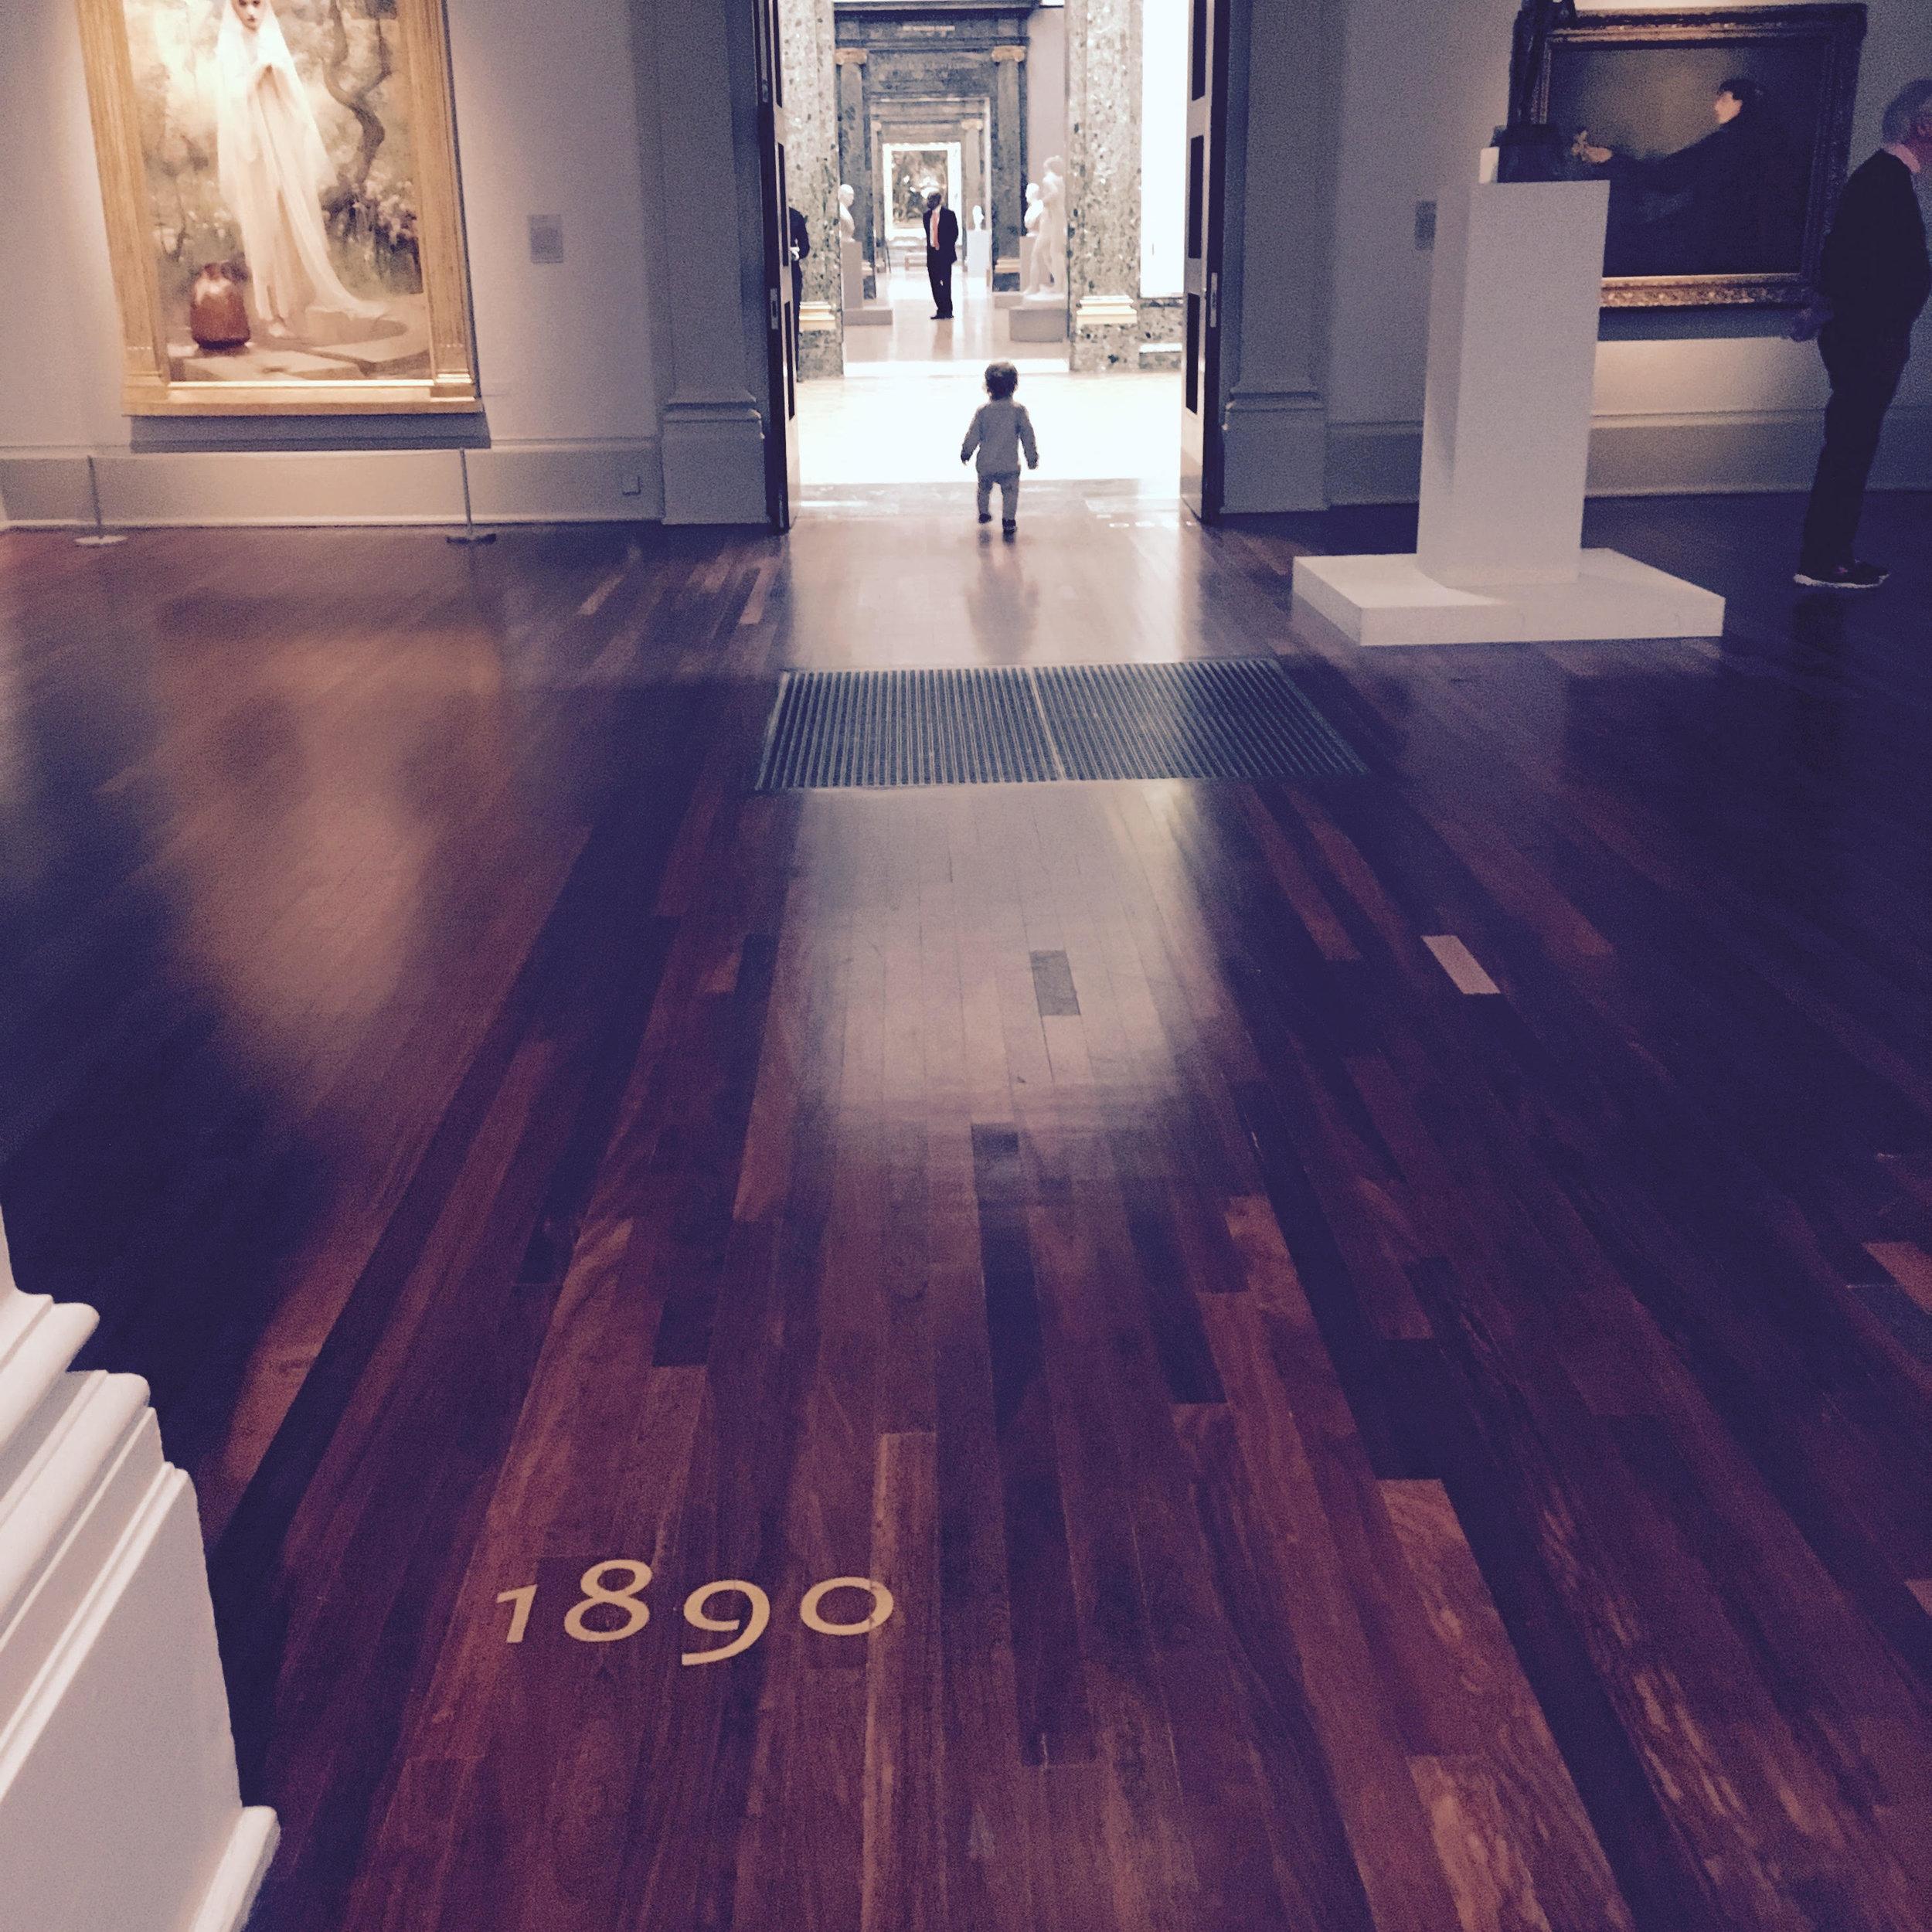 Tate Britain Millbank wandering toddler